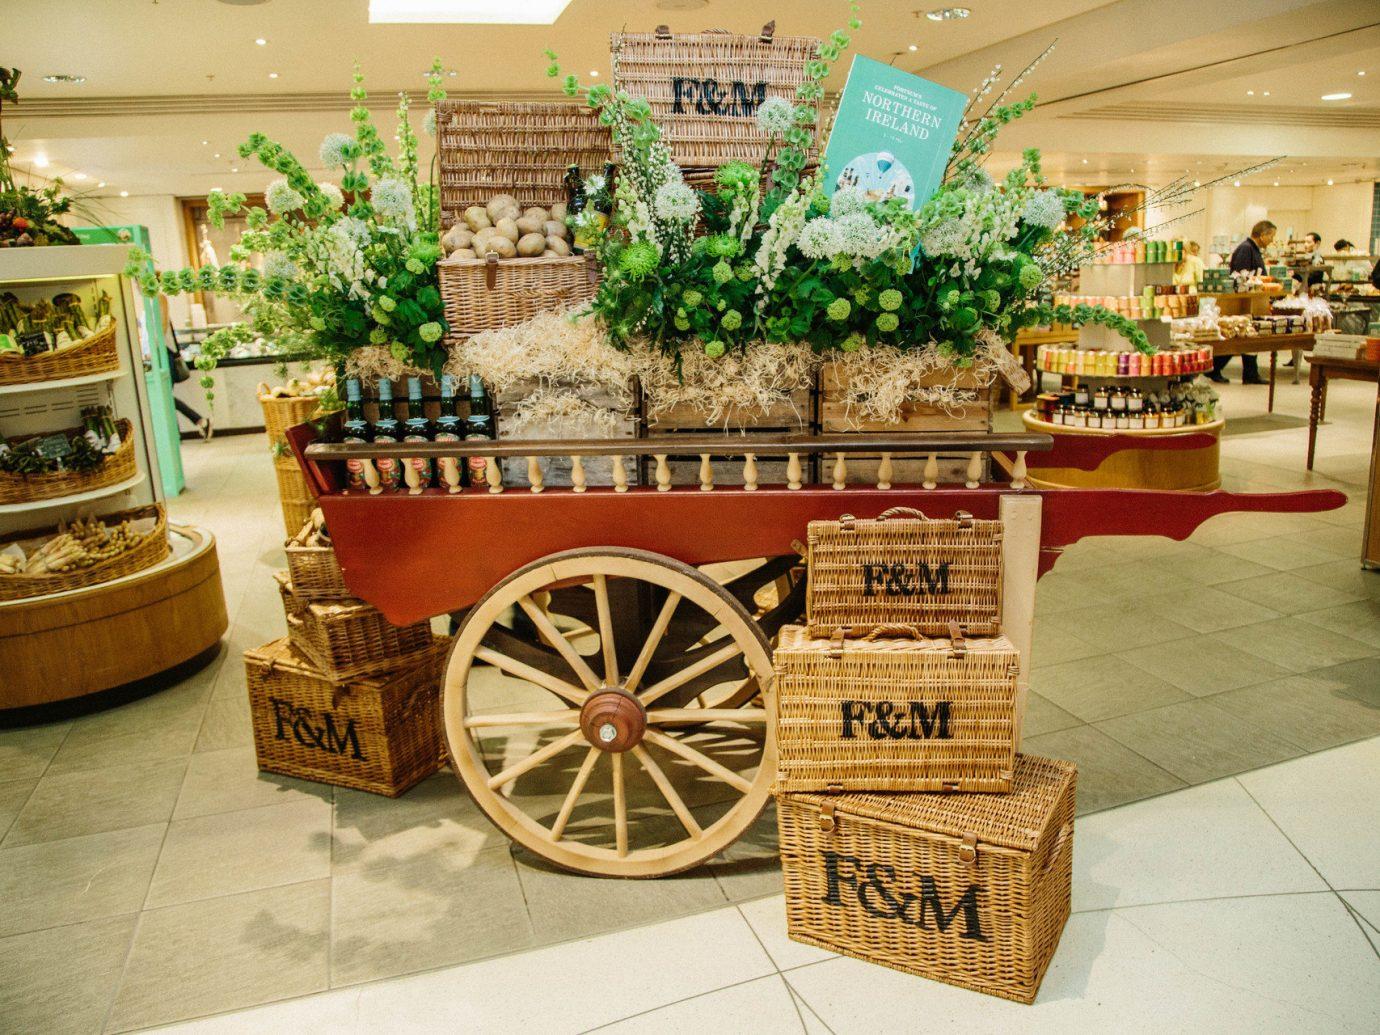 basket food Food + Drink gourmet grocery interior Shop shopping store floor indoor tourist attraction